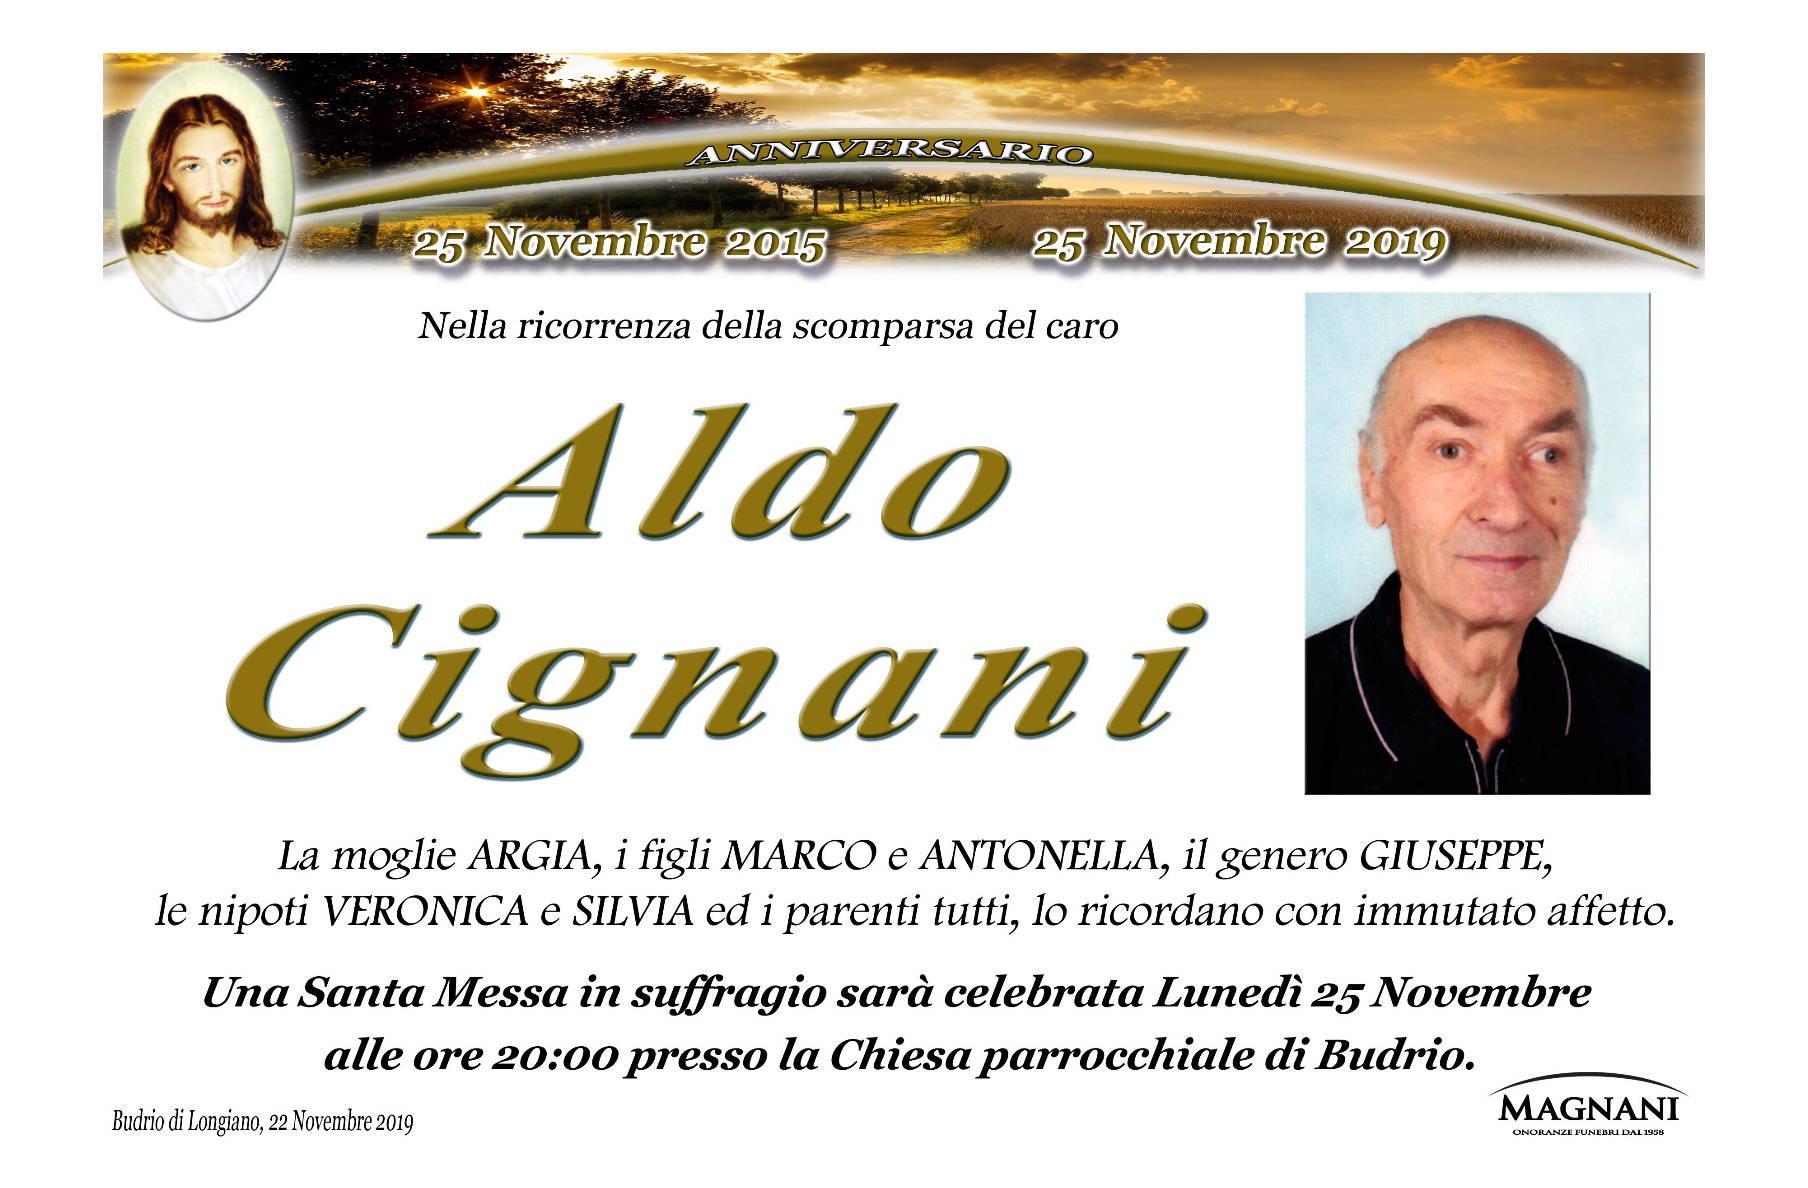 Aldo Cignani